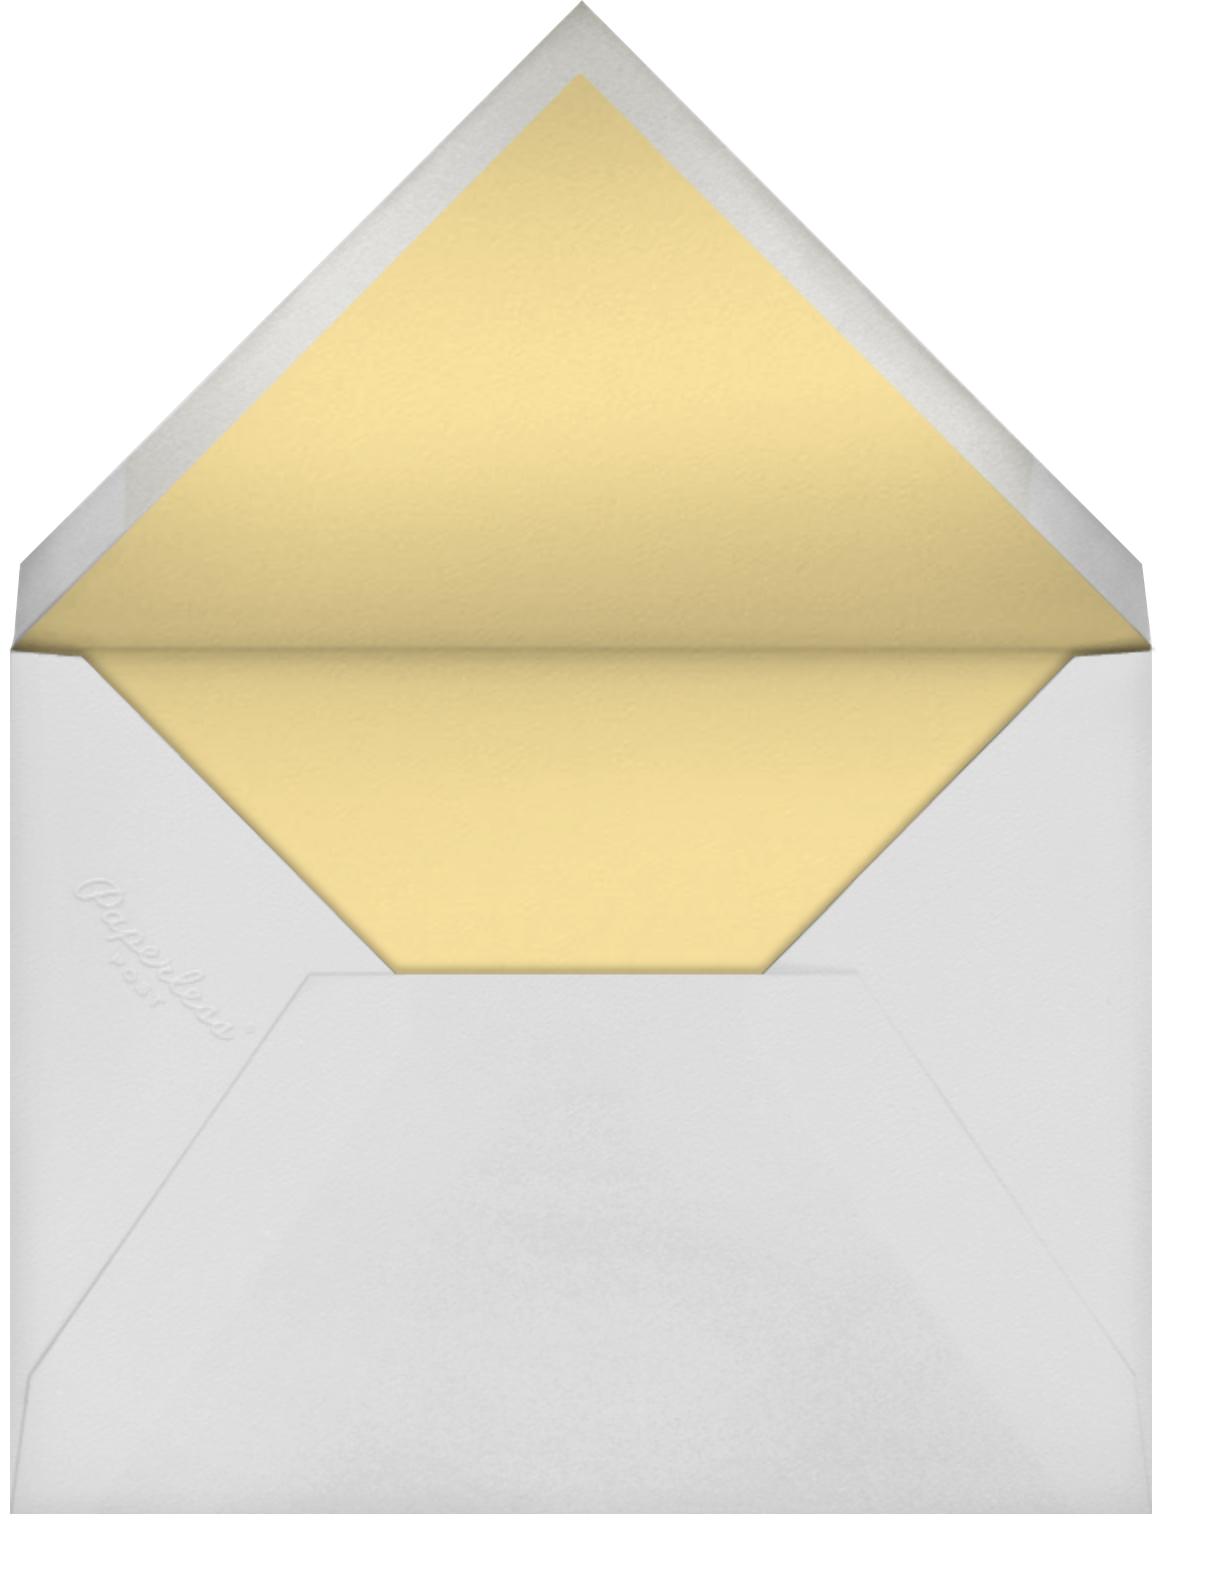 Challah - Paperless Post - Envelope